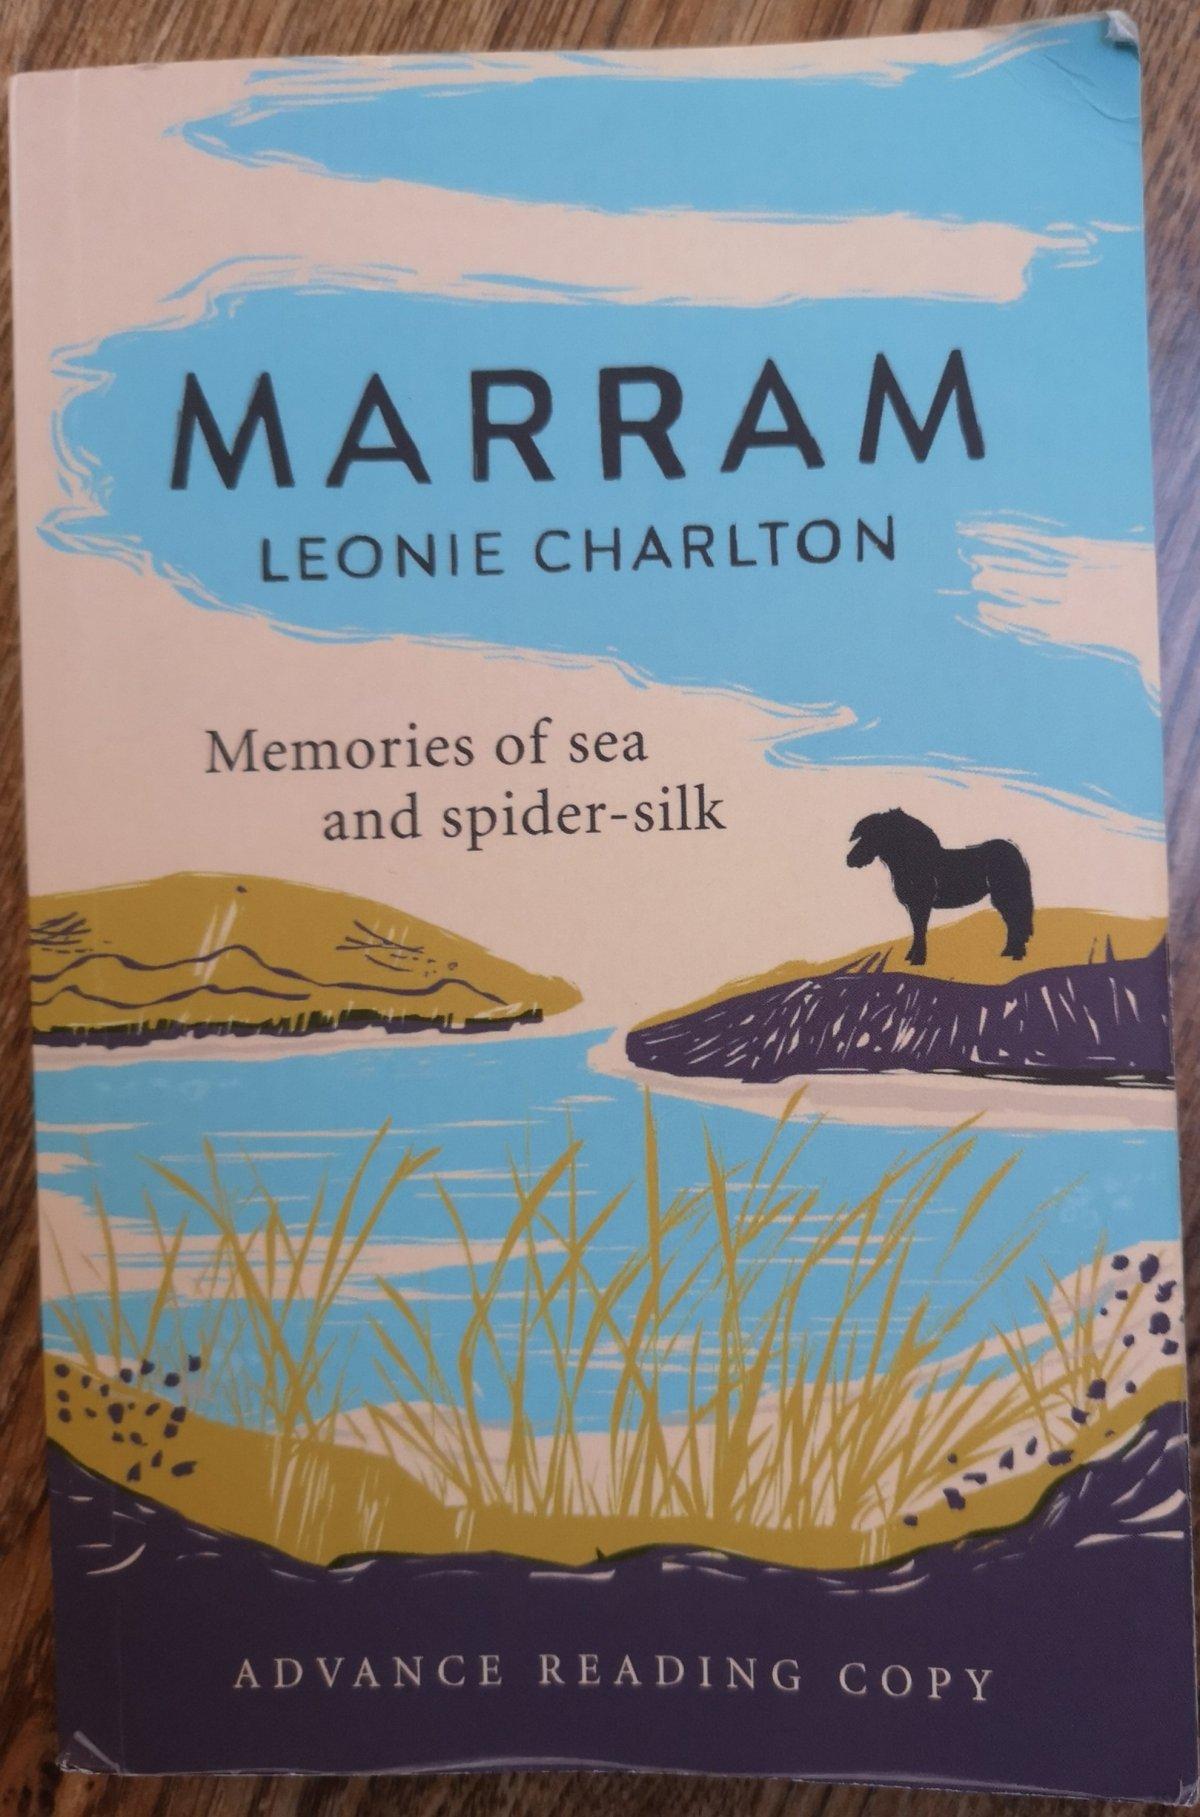 Marram – LeonieCharlton